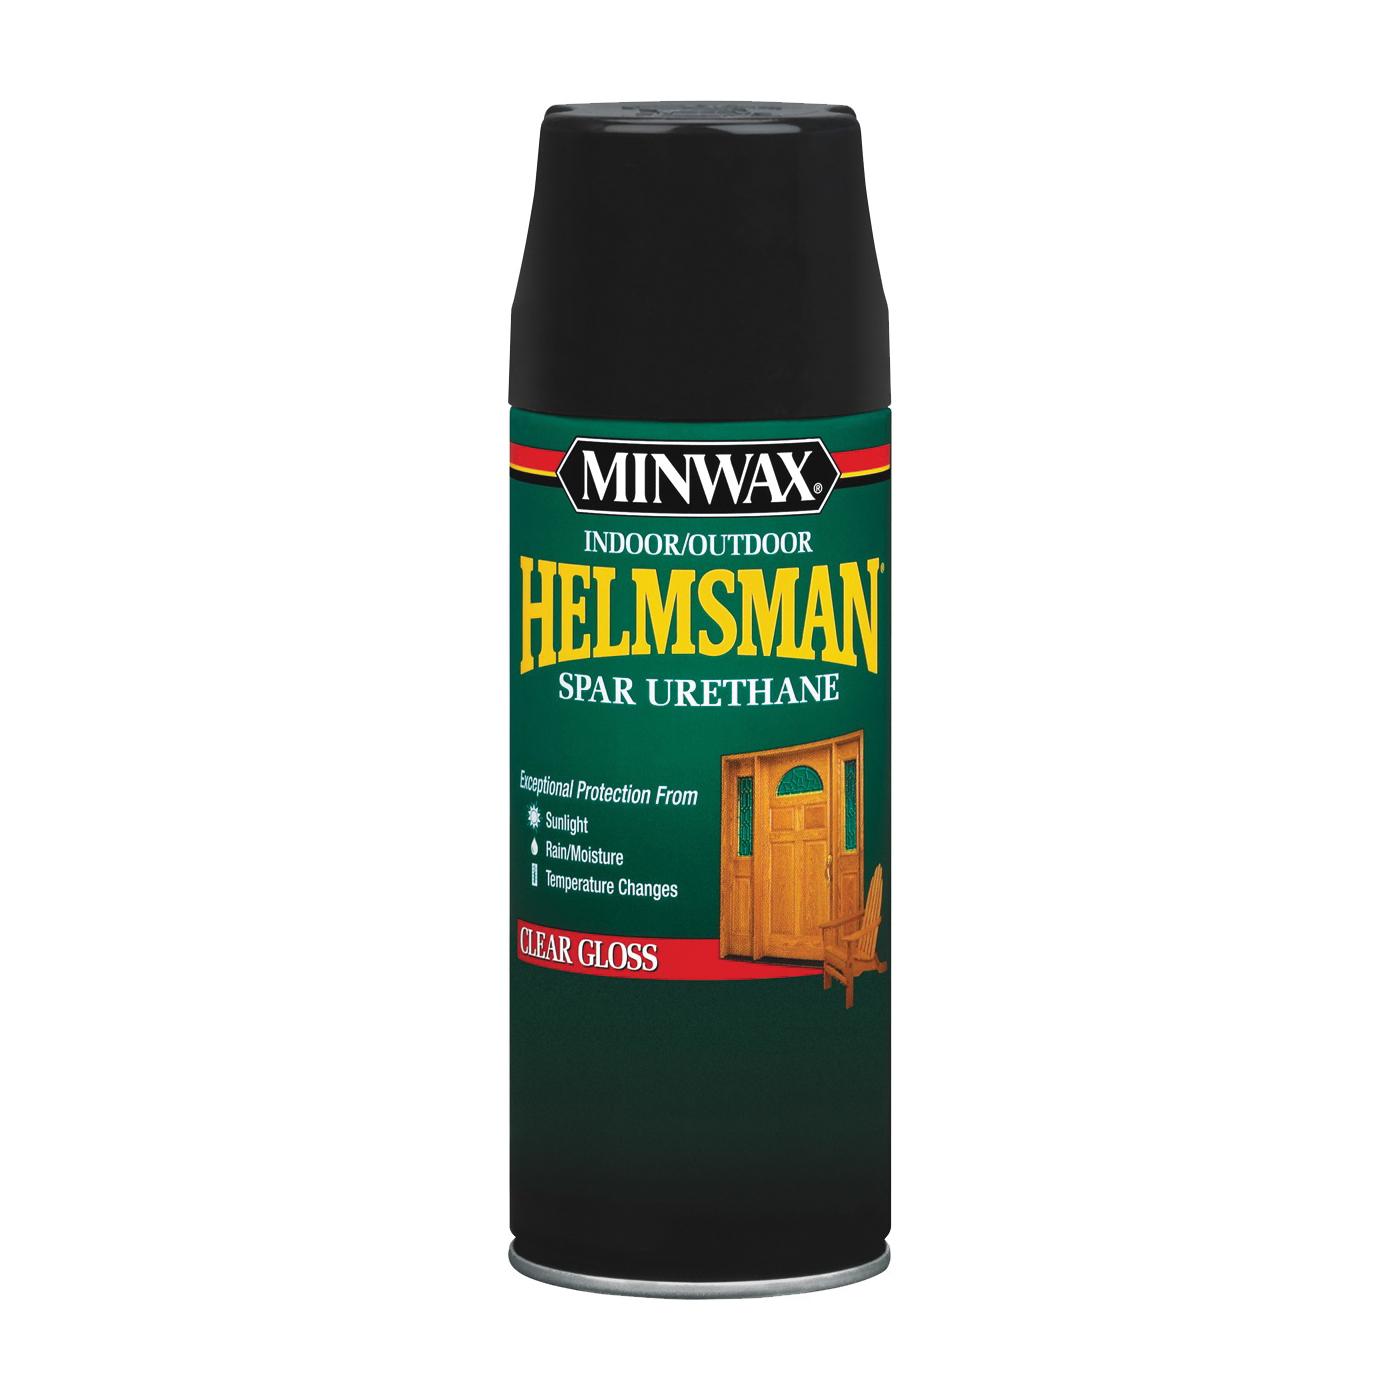 Picture of Minwax Helmsman 33250000 Spar Urethane Paint, Clear Gloss, Clear, Liquid, 11.5 oz, Aerosol Can